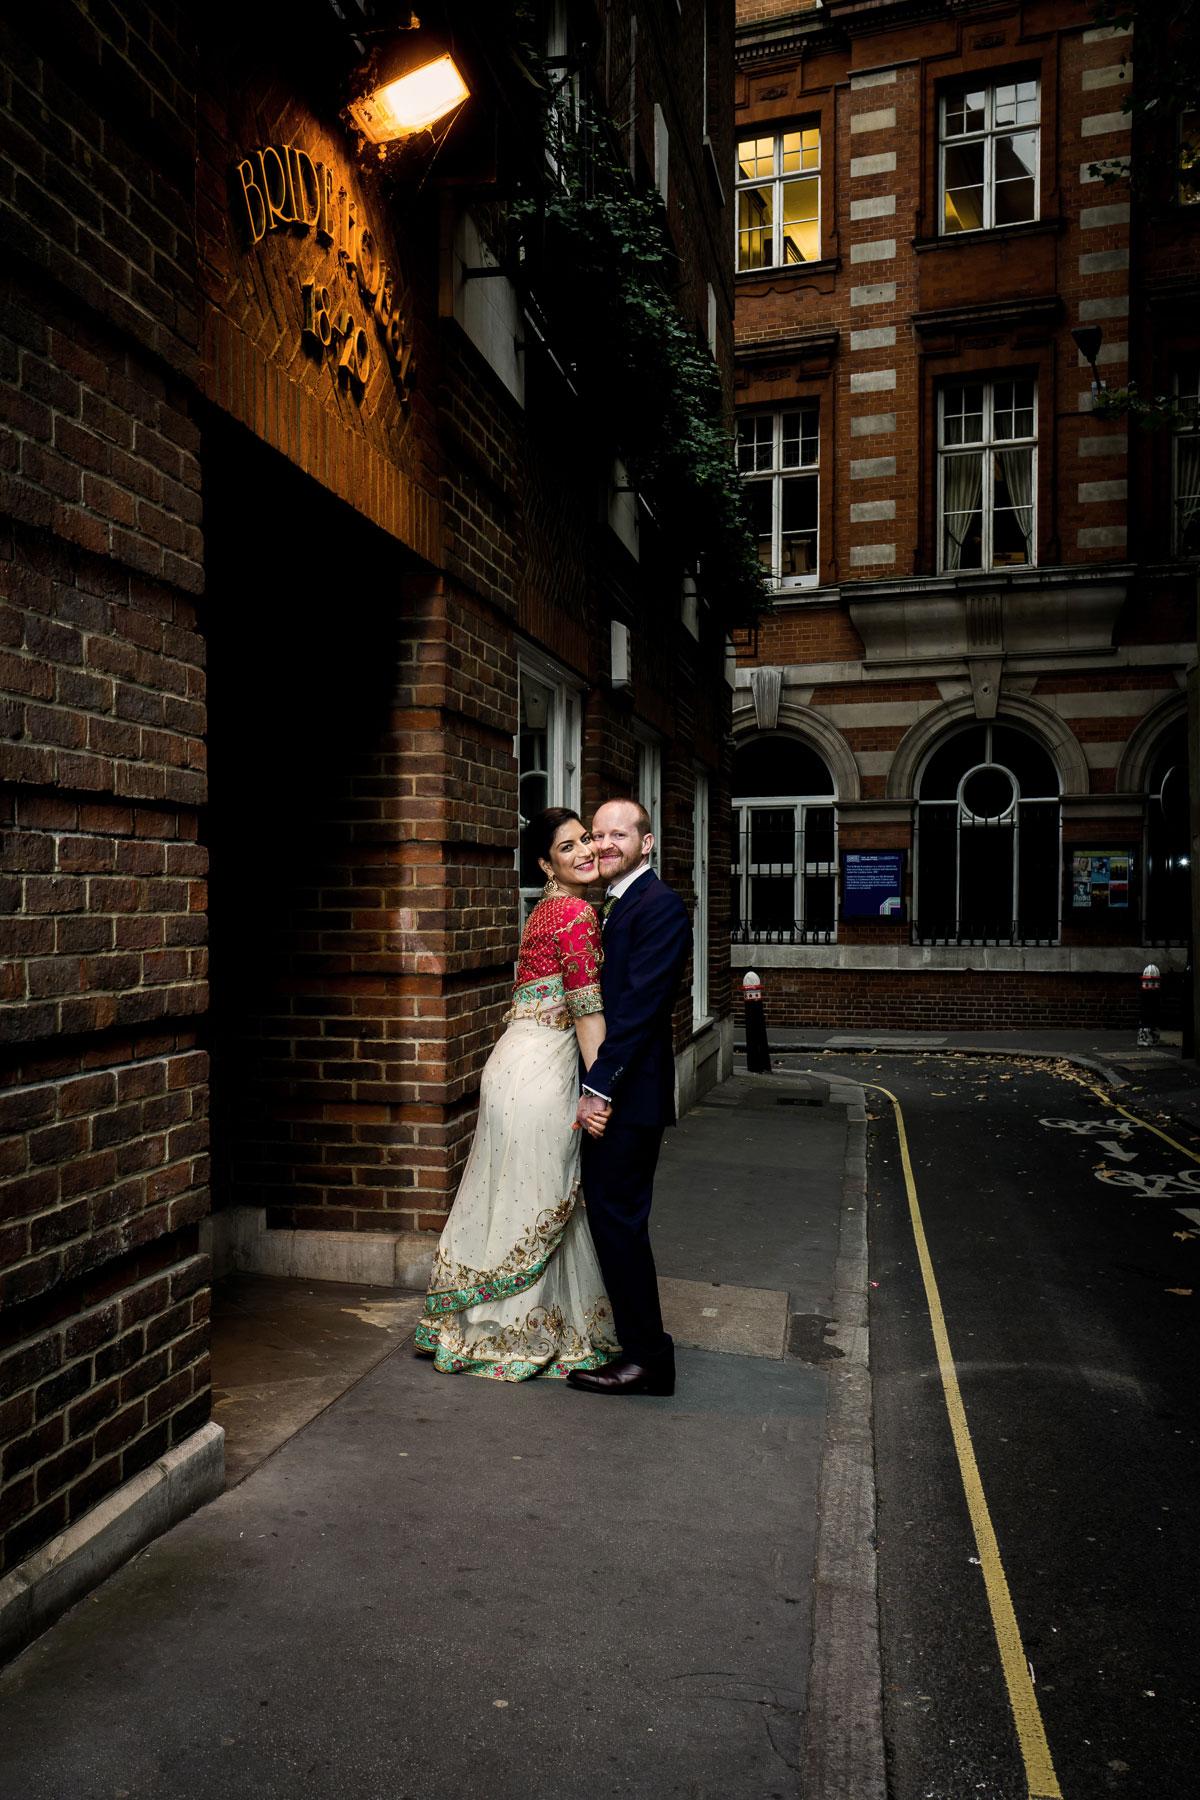 wedding-at-st-brides-0016